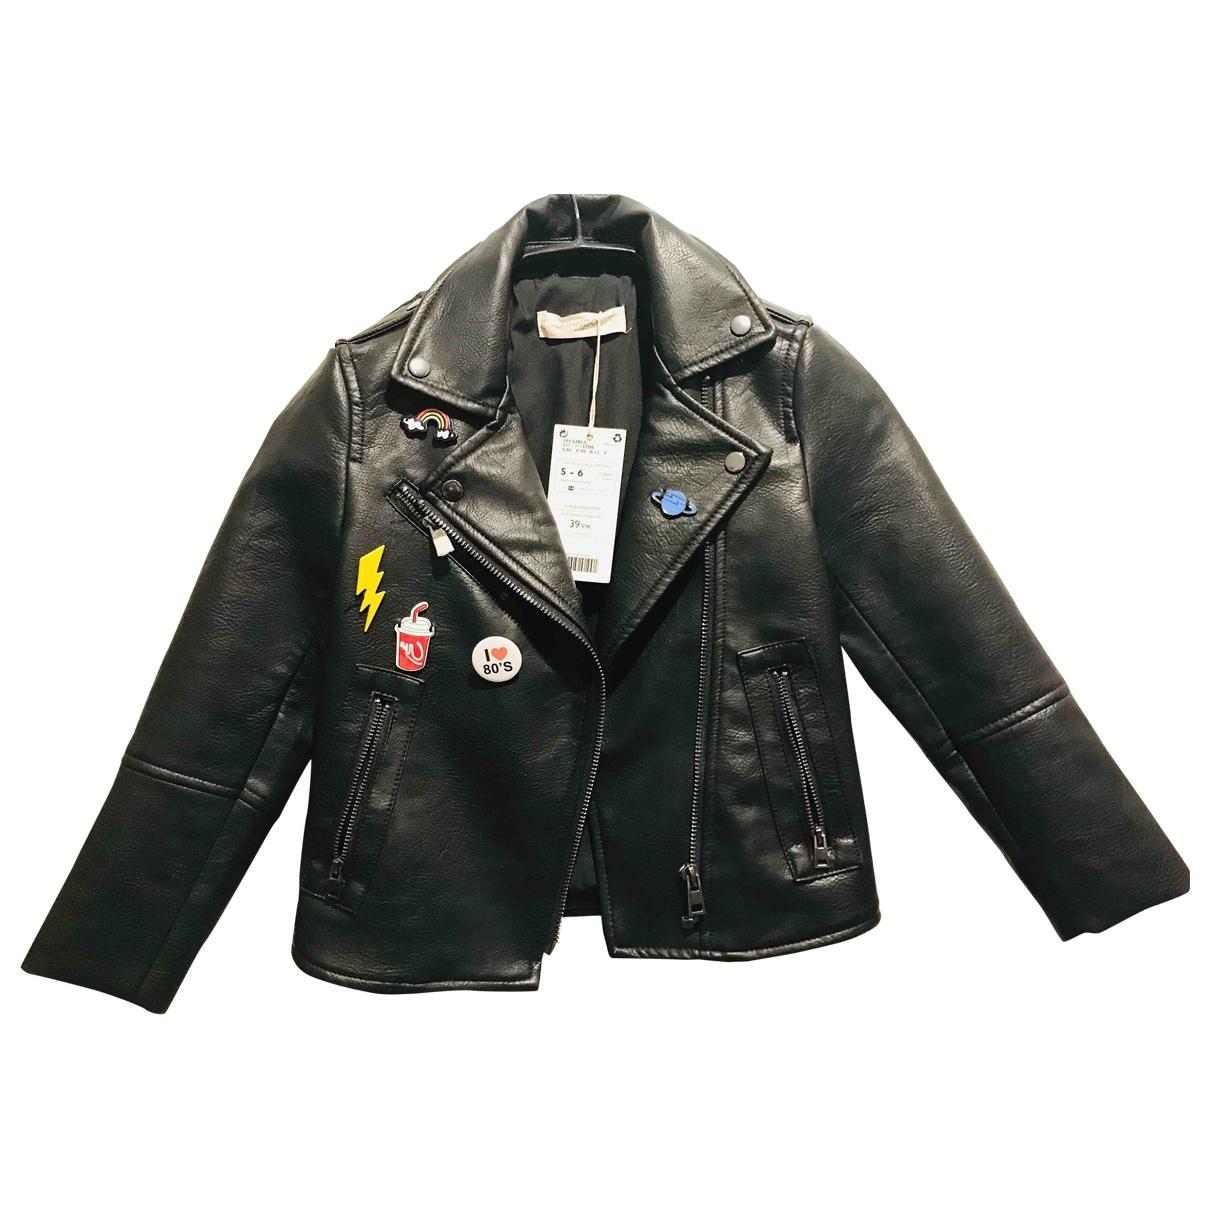 Mango \N Black jacket & coat for Kids 5 years - up to 108cm FR